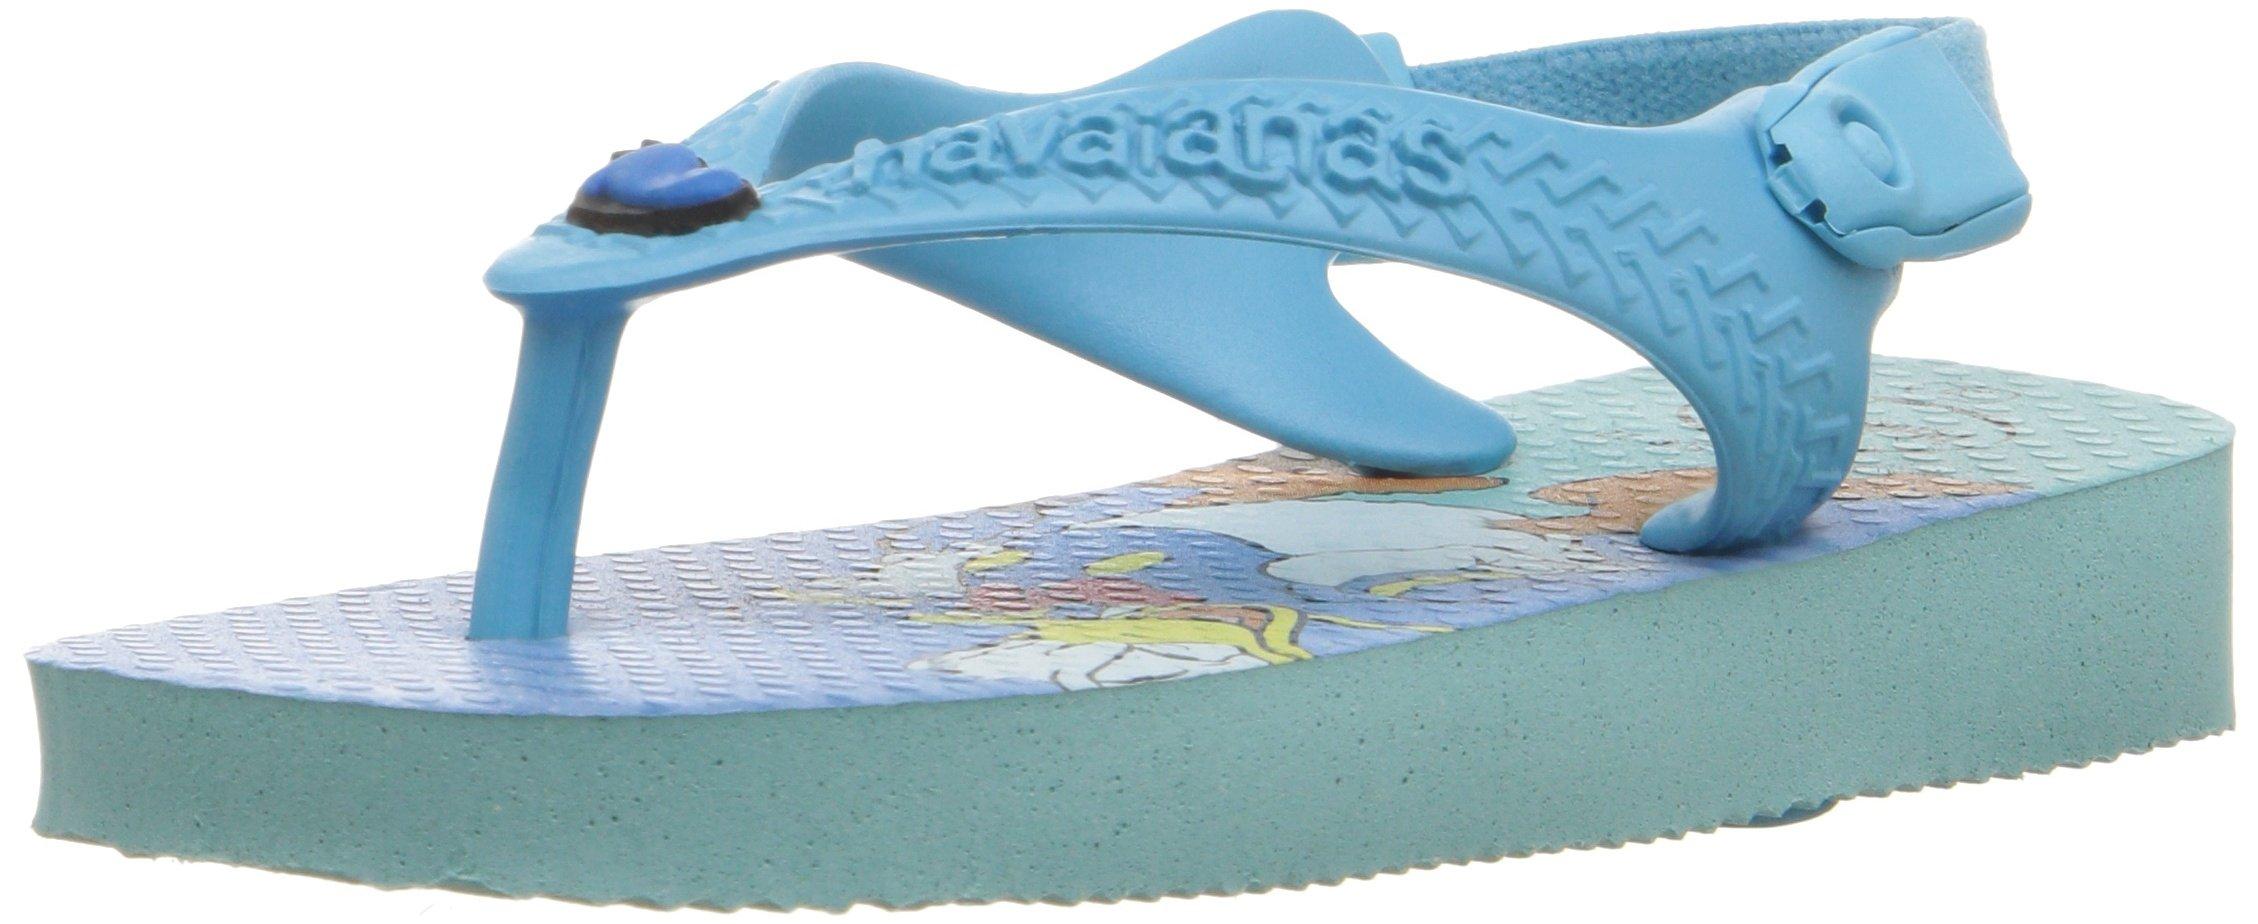 Havaianas Kids Flip Flop Sandals, Disney Classics, Donald Duck, Ice Blue ,Ice Blue,21 BR (7 M US Toddler)